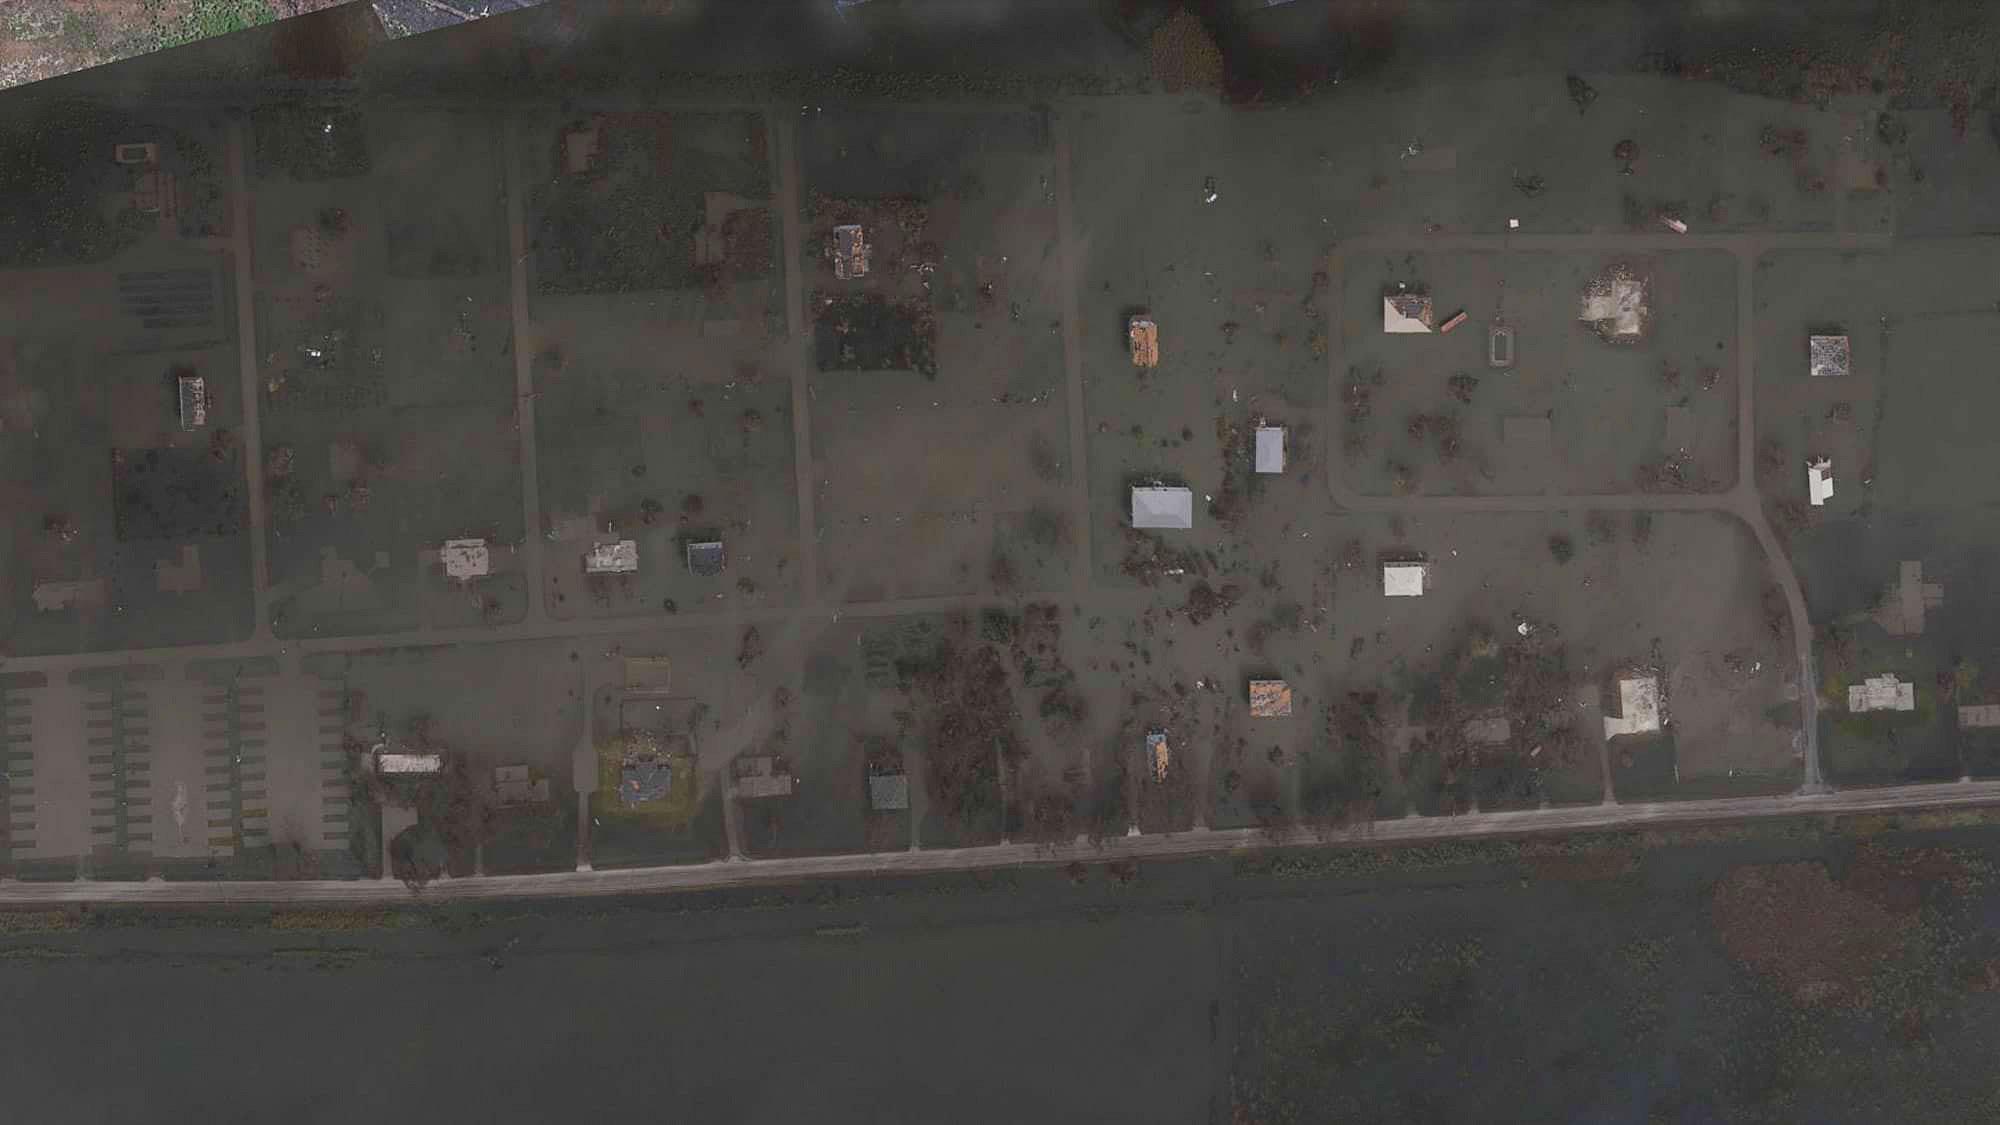 an image showing the area near Cameron, Louisiana before Laura